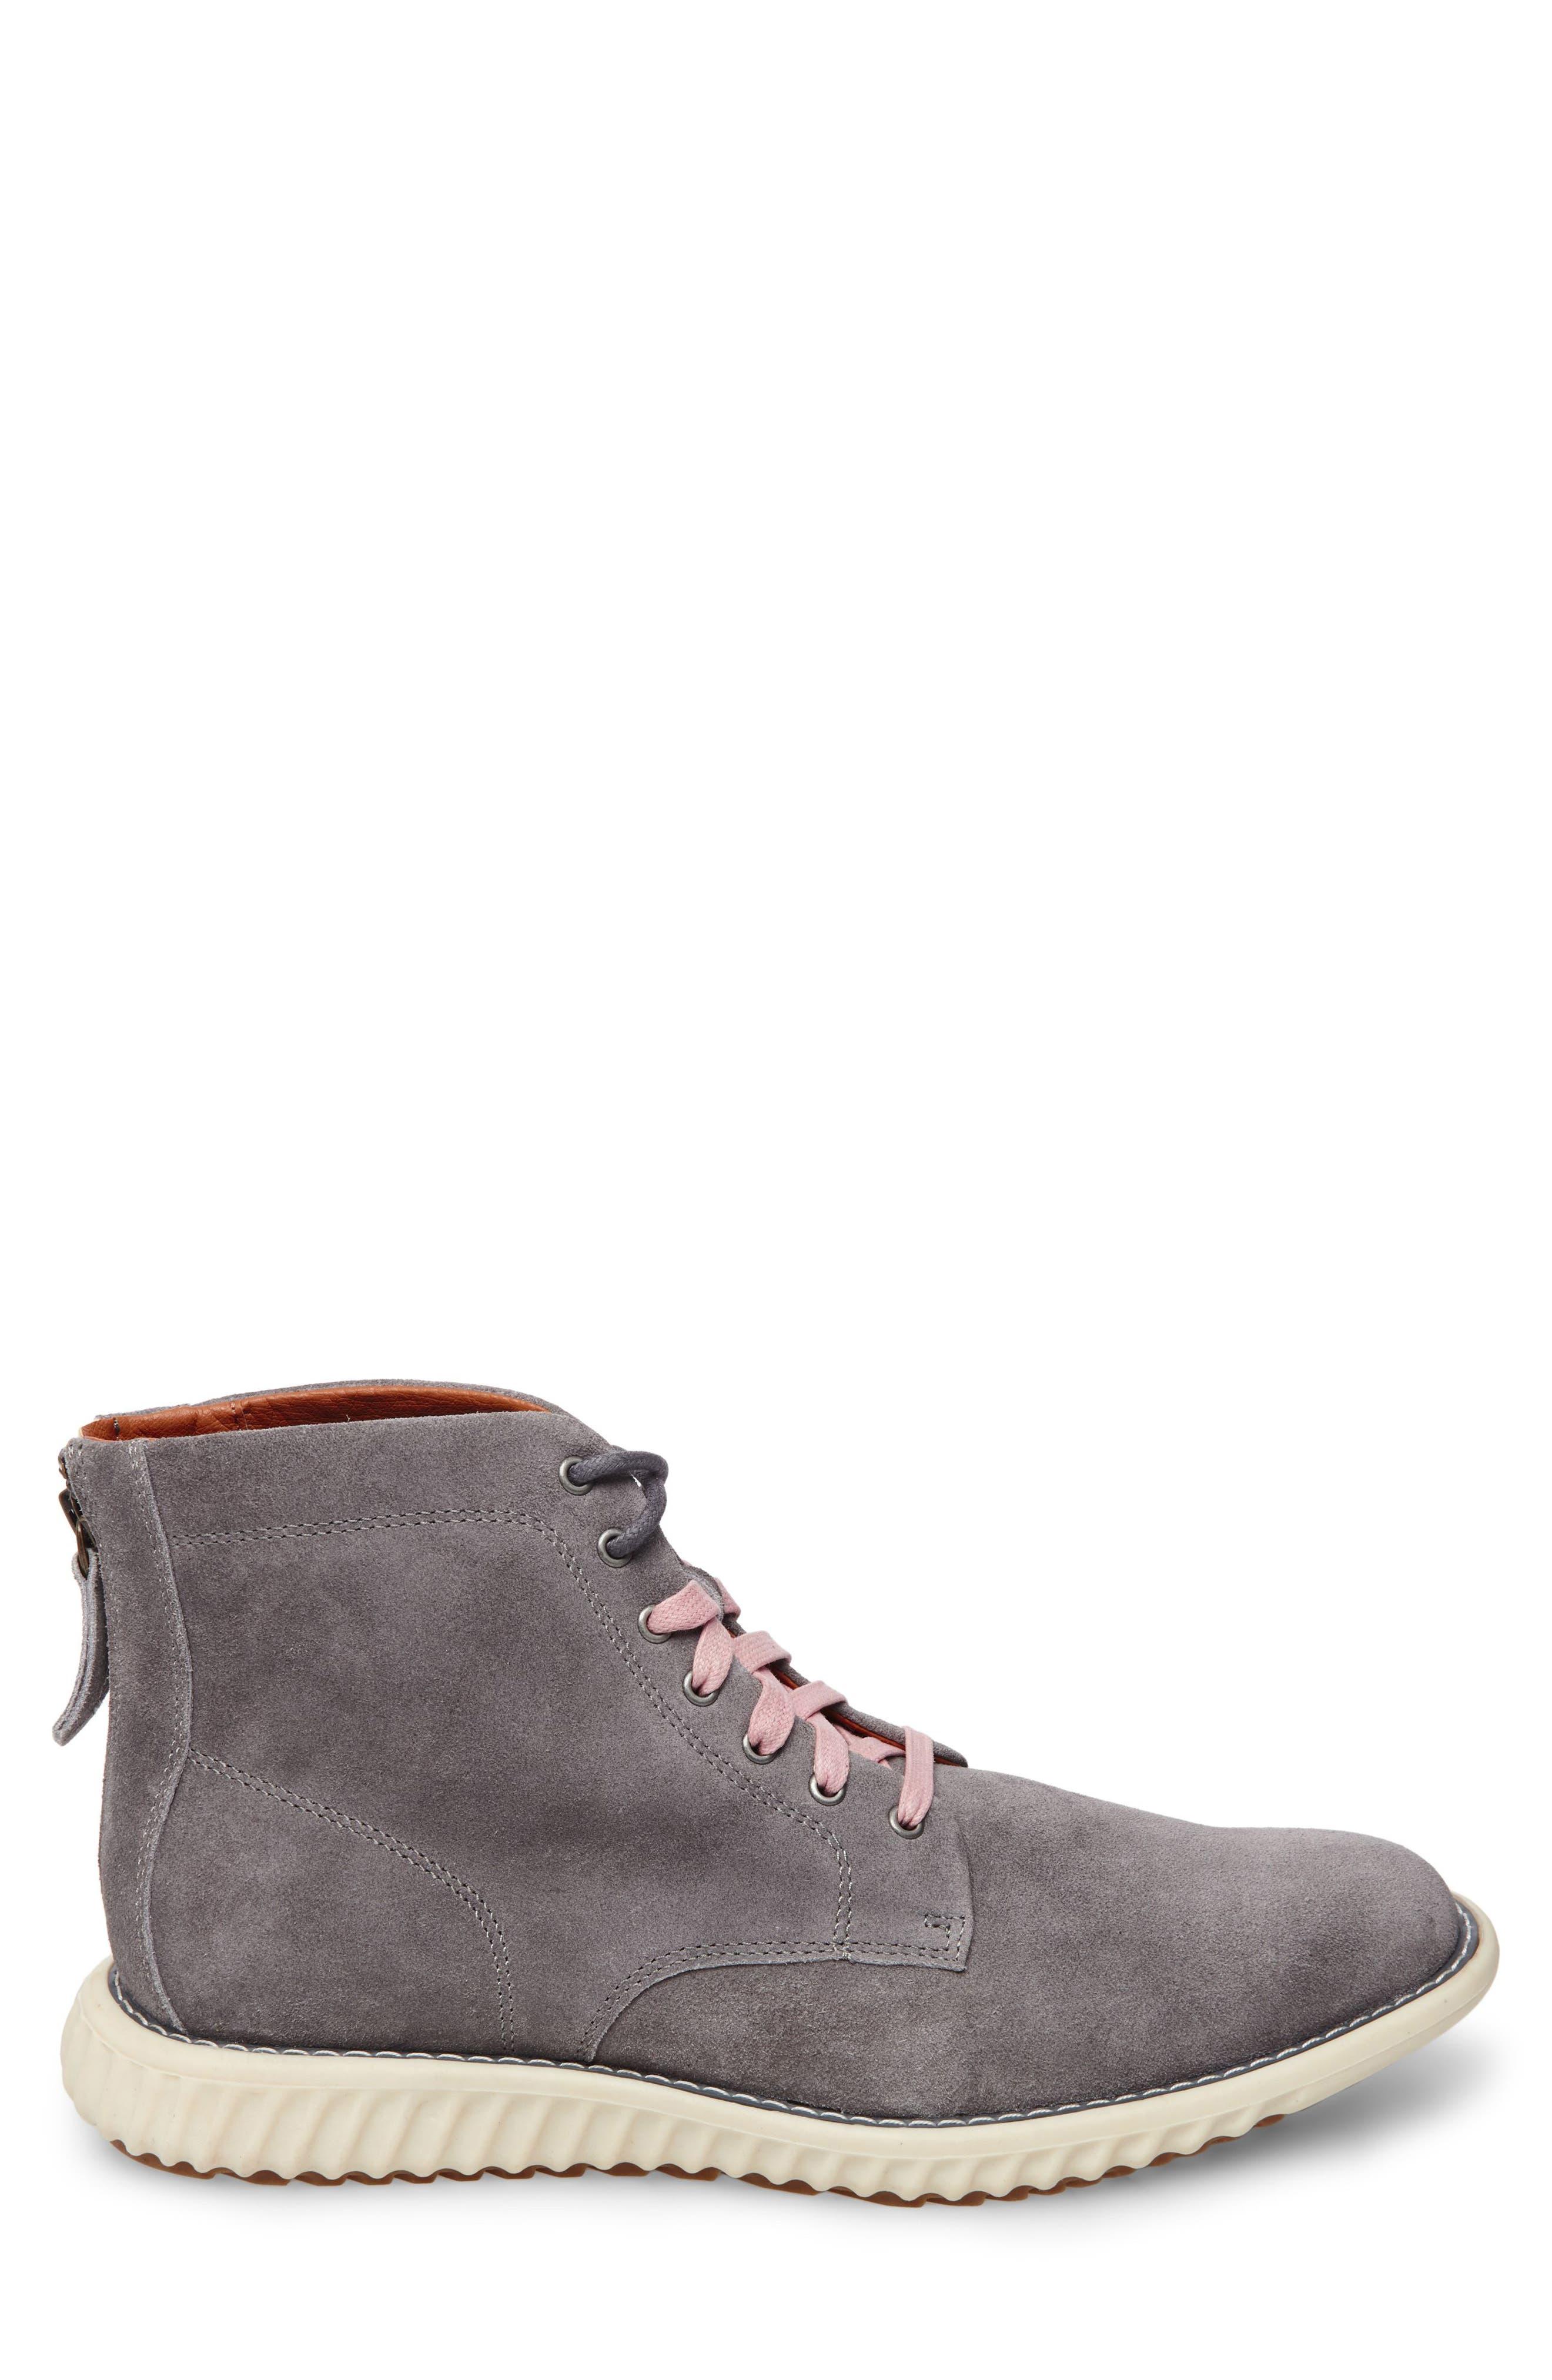 Verner Suede Plain Toe Boot,                             Alternate thumbnail 3, color,                             074